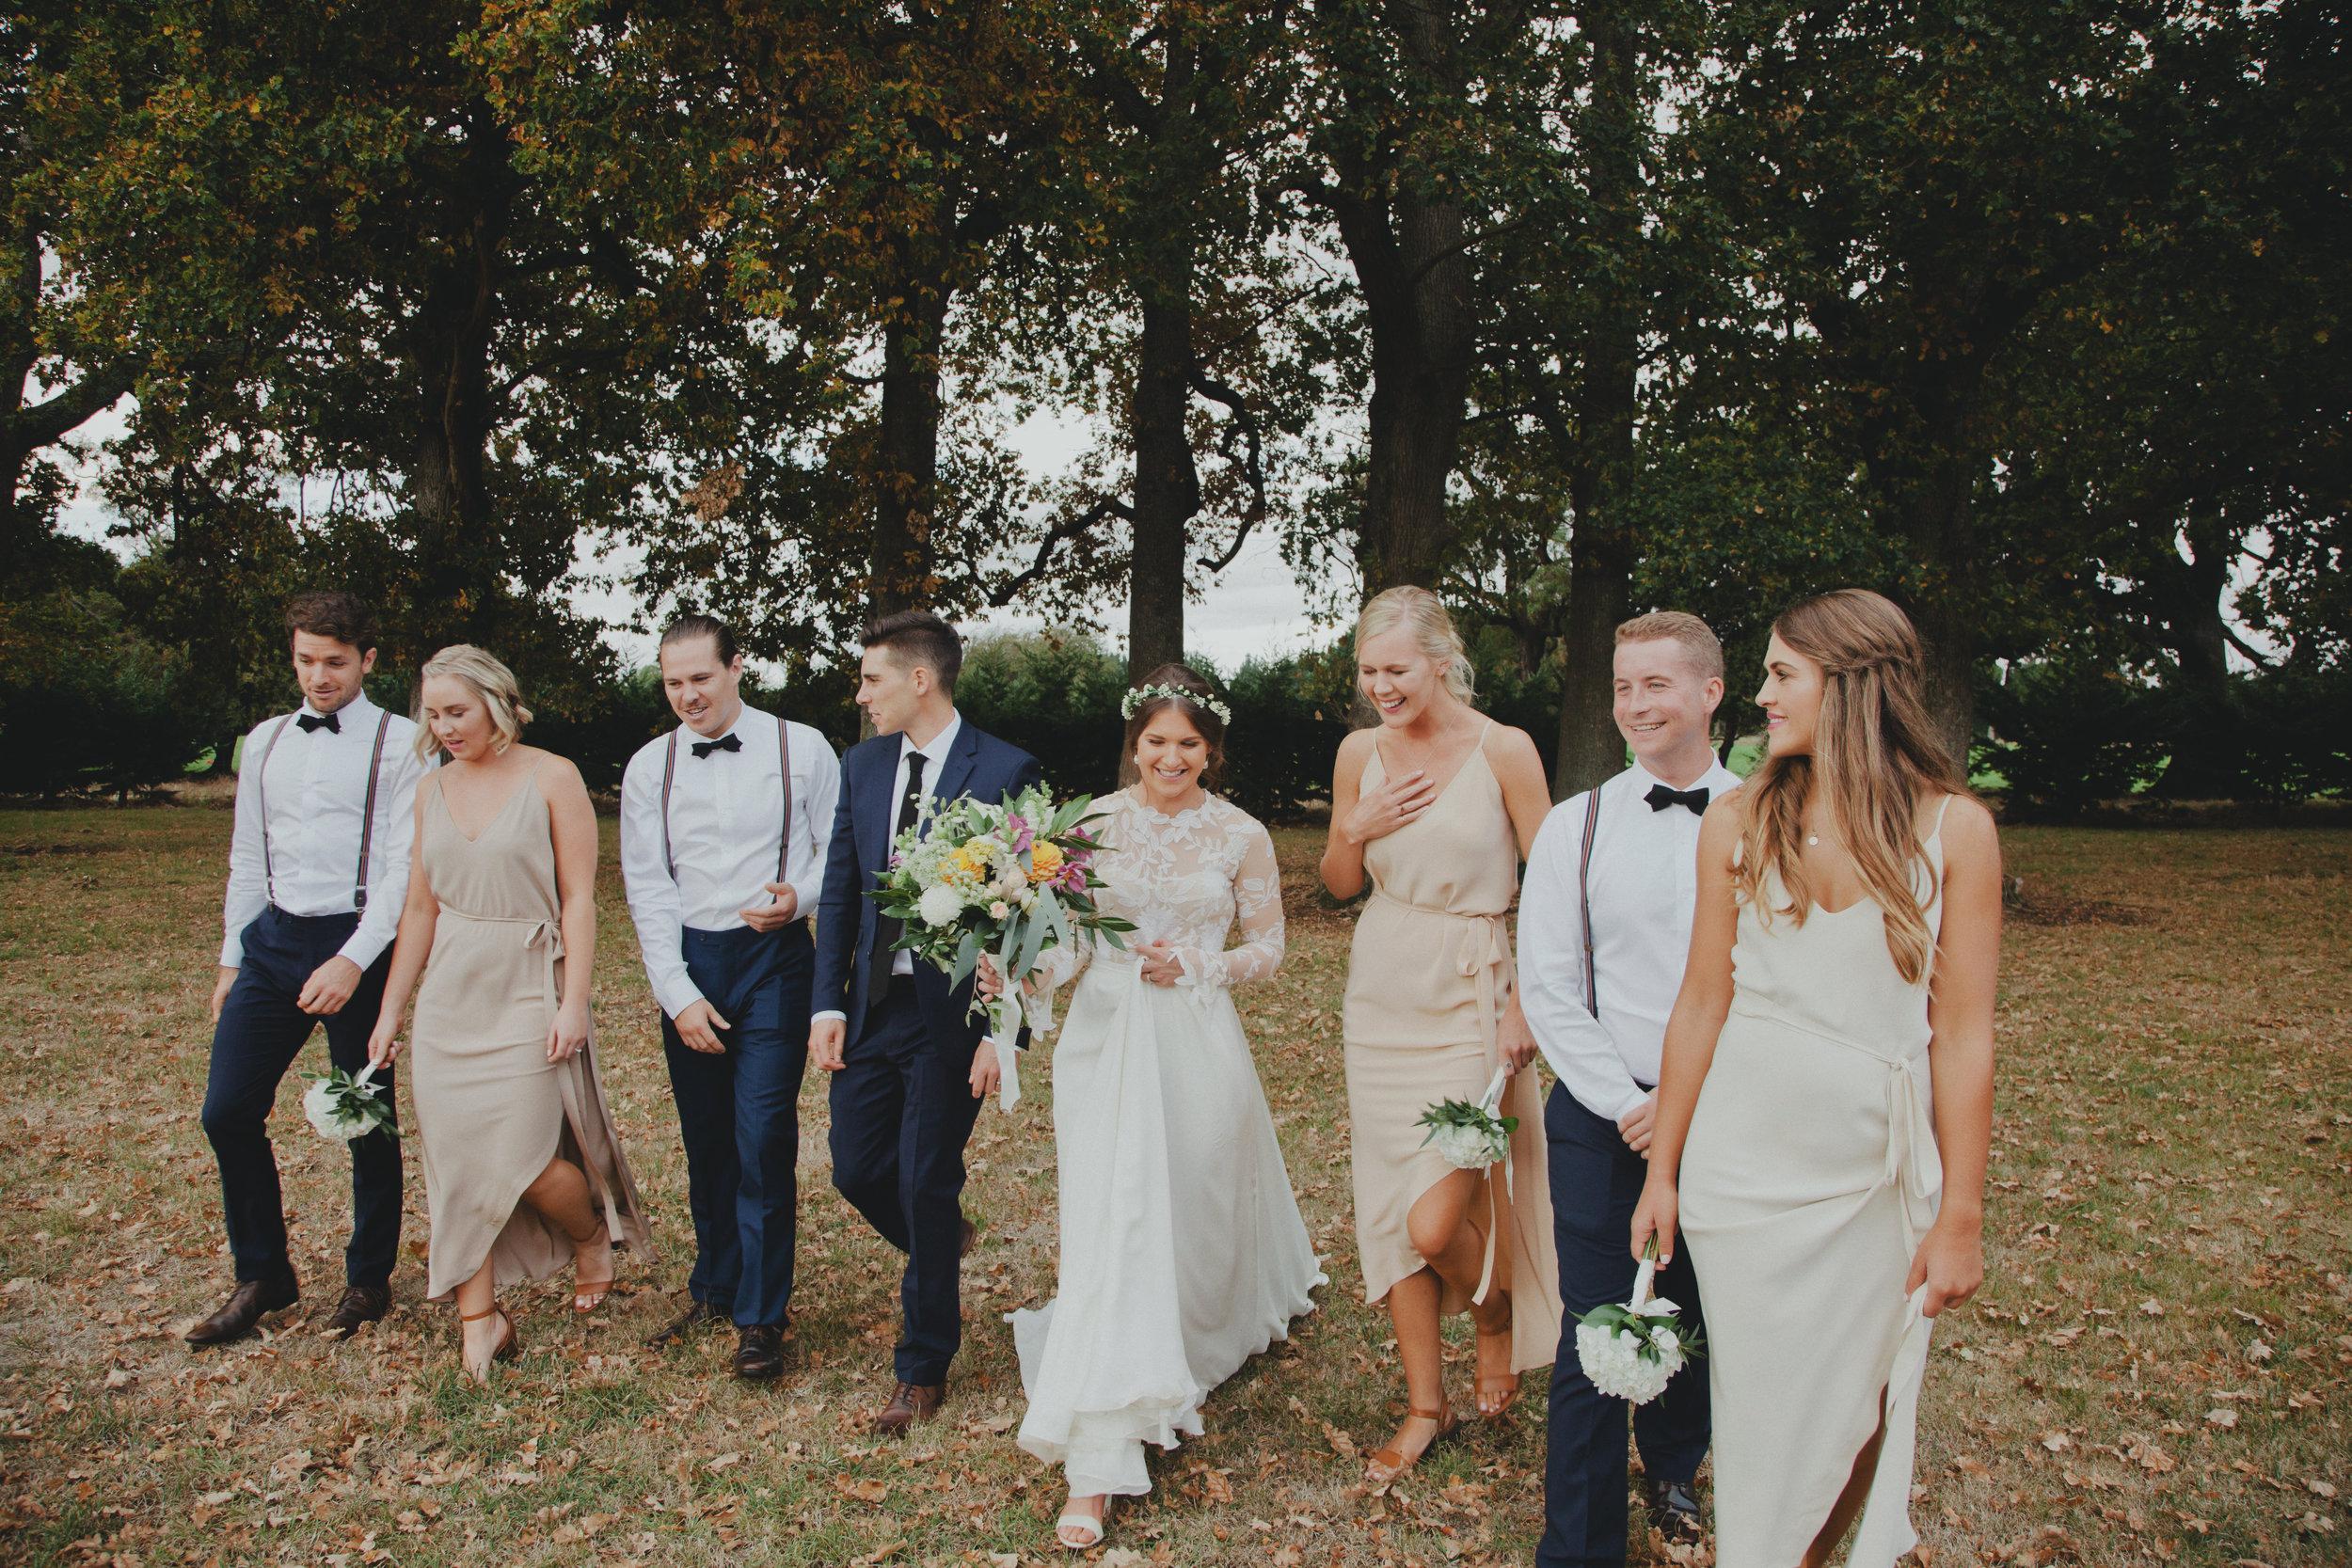 wellington wedding photography NZ - 1069.JPG